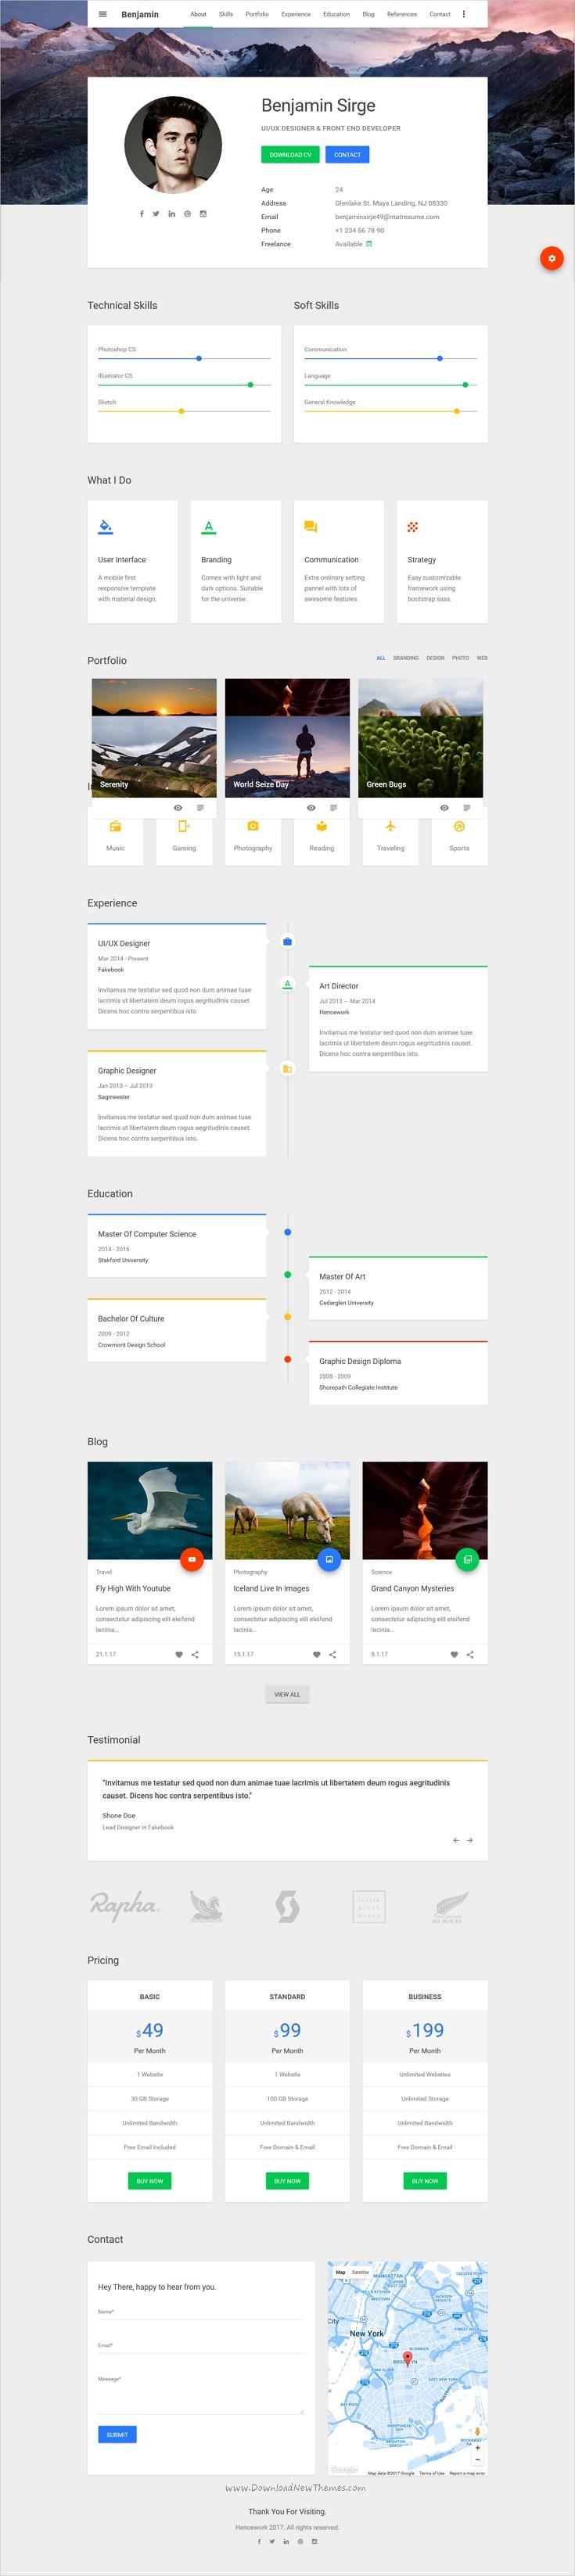 Großartig One Page Vcard Lebenslauf Portfolio Website Vorlage ...